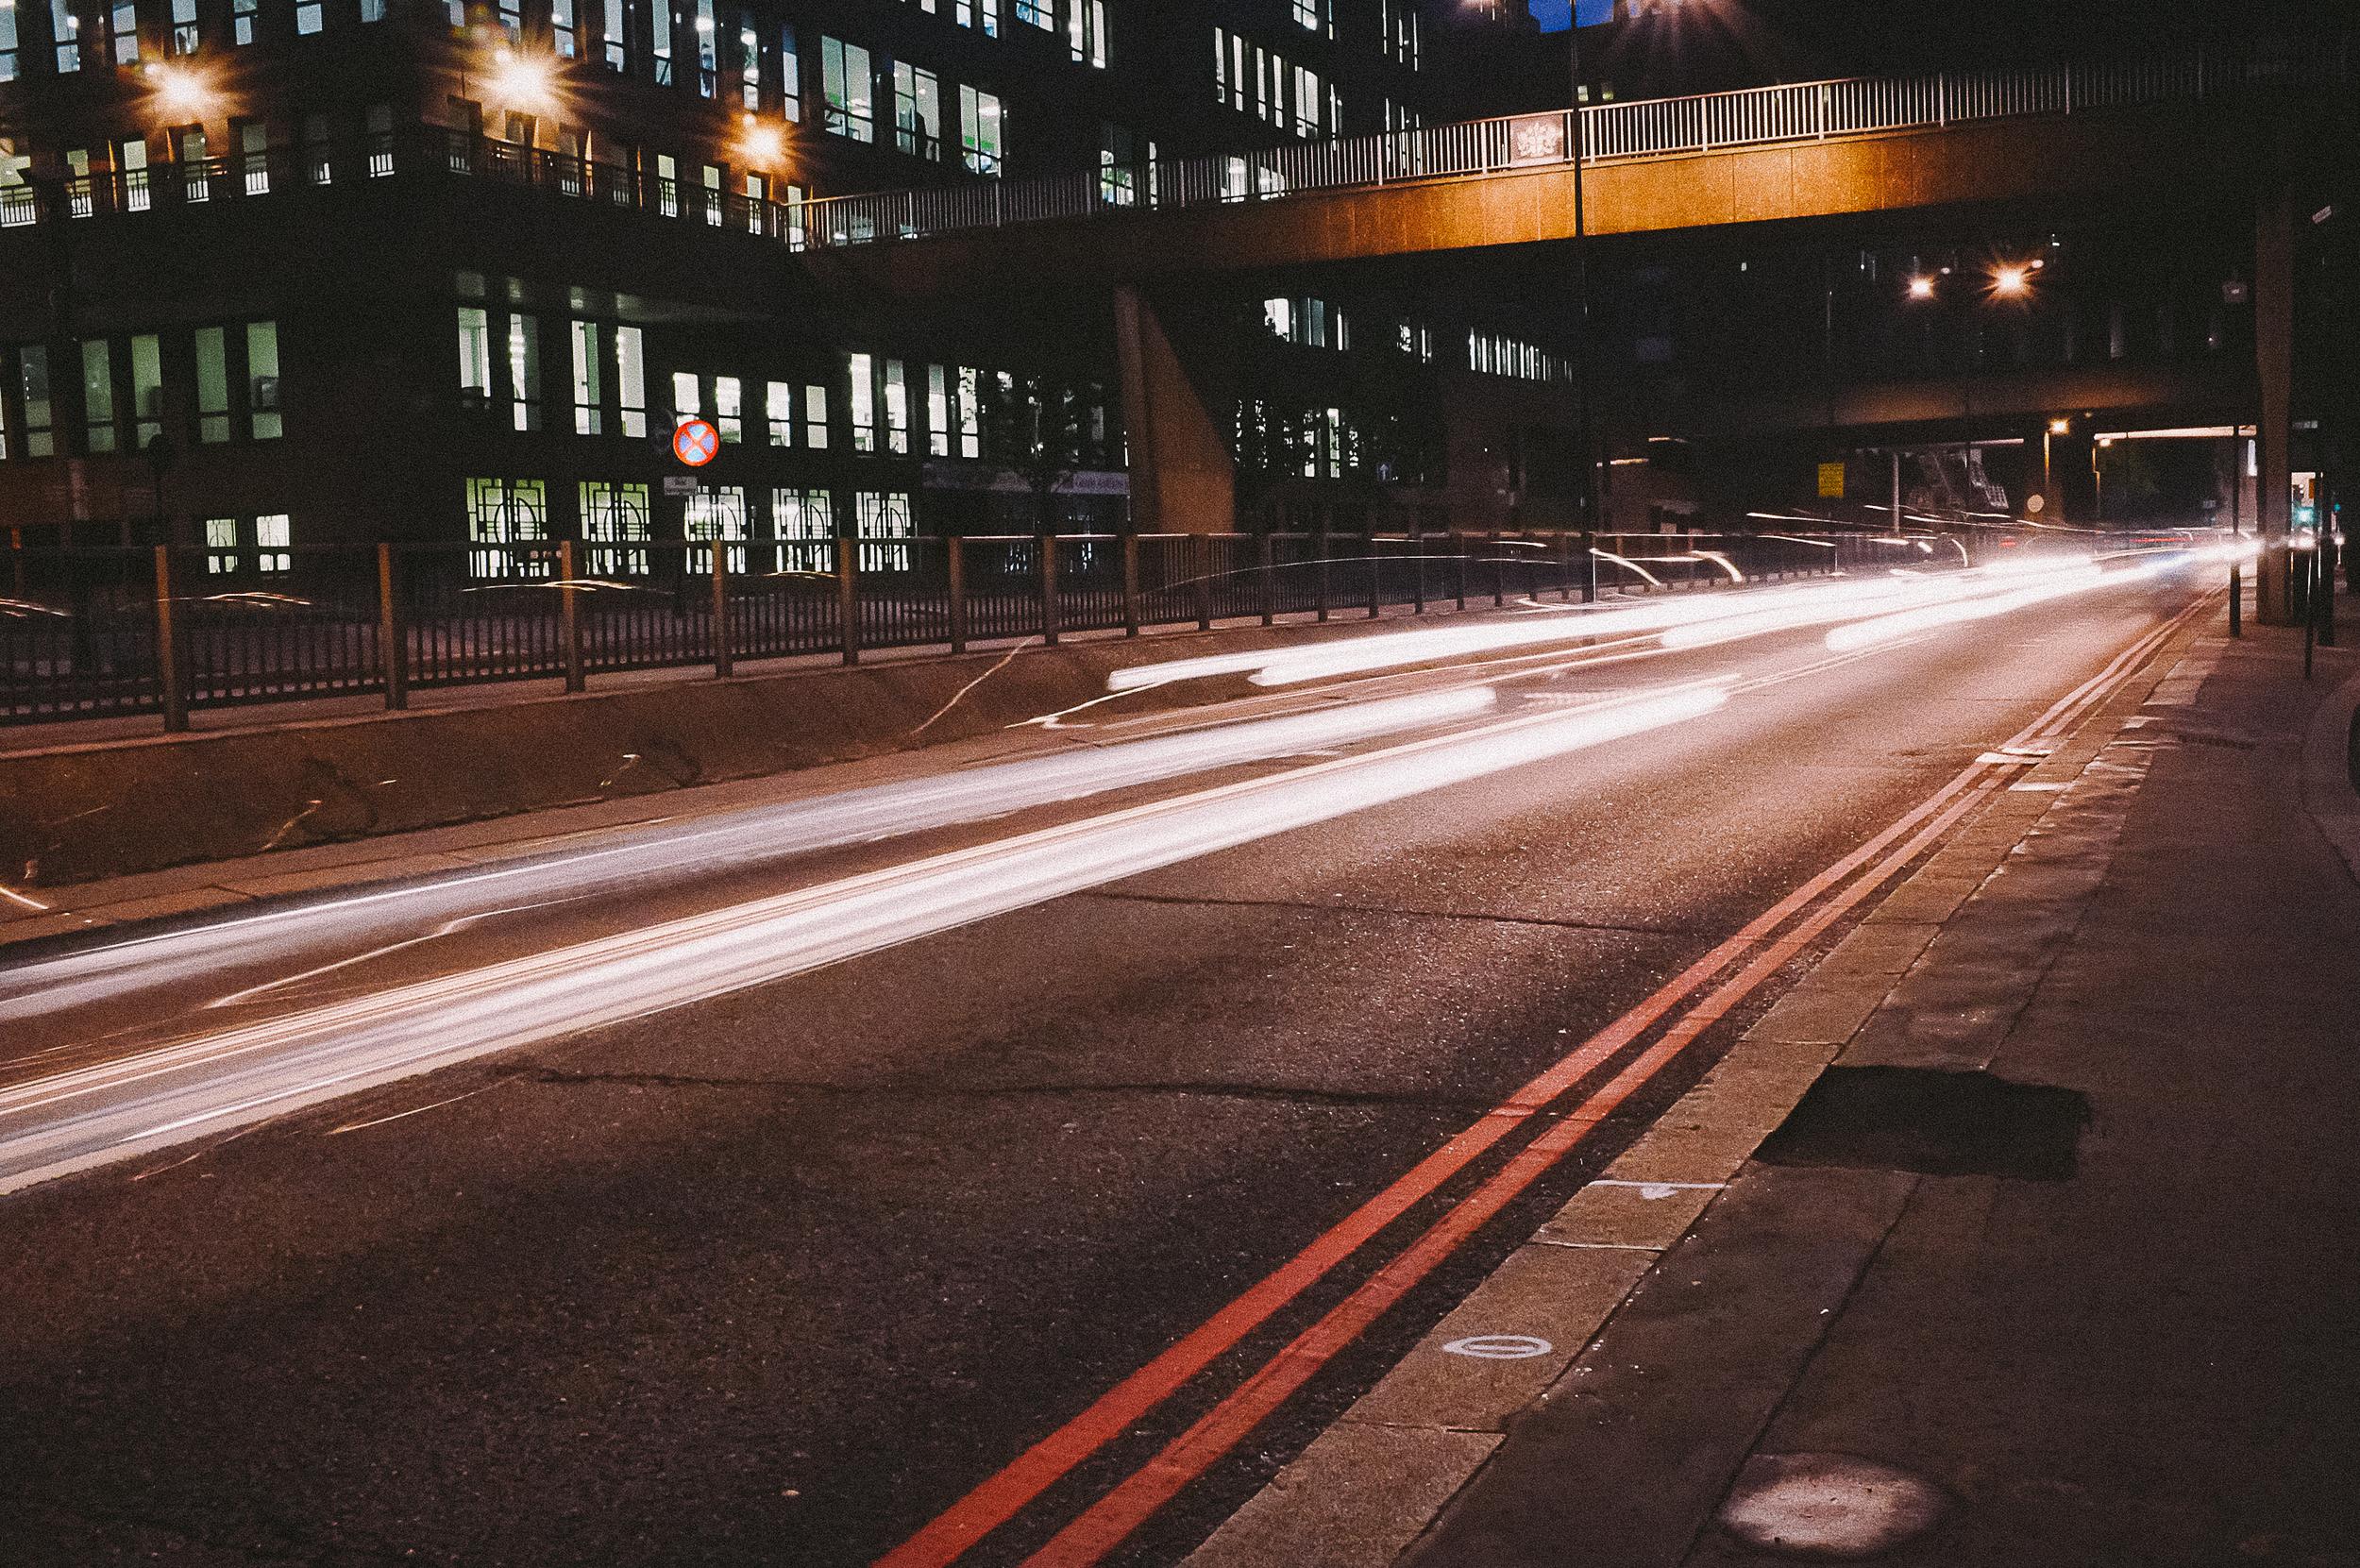 fujix100 street photography-9.jpg